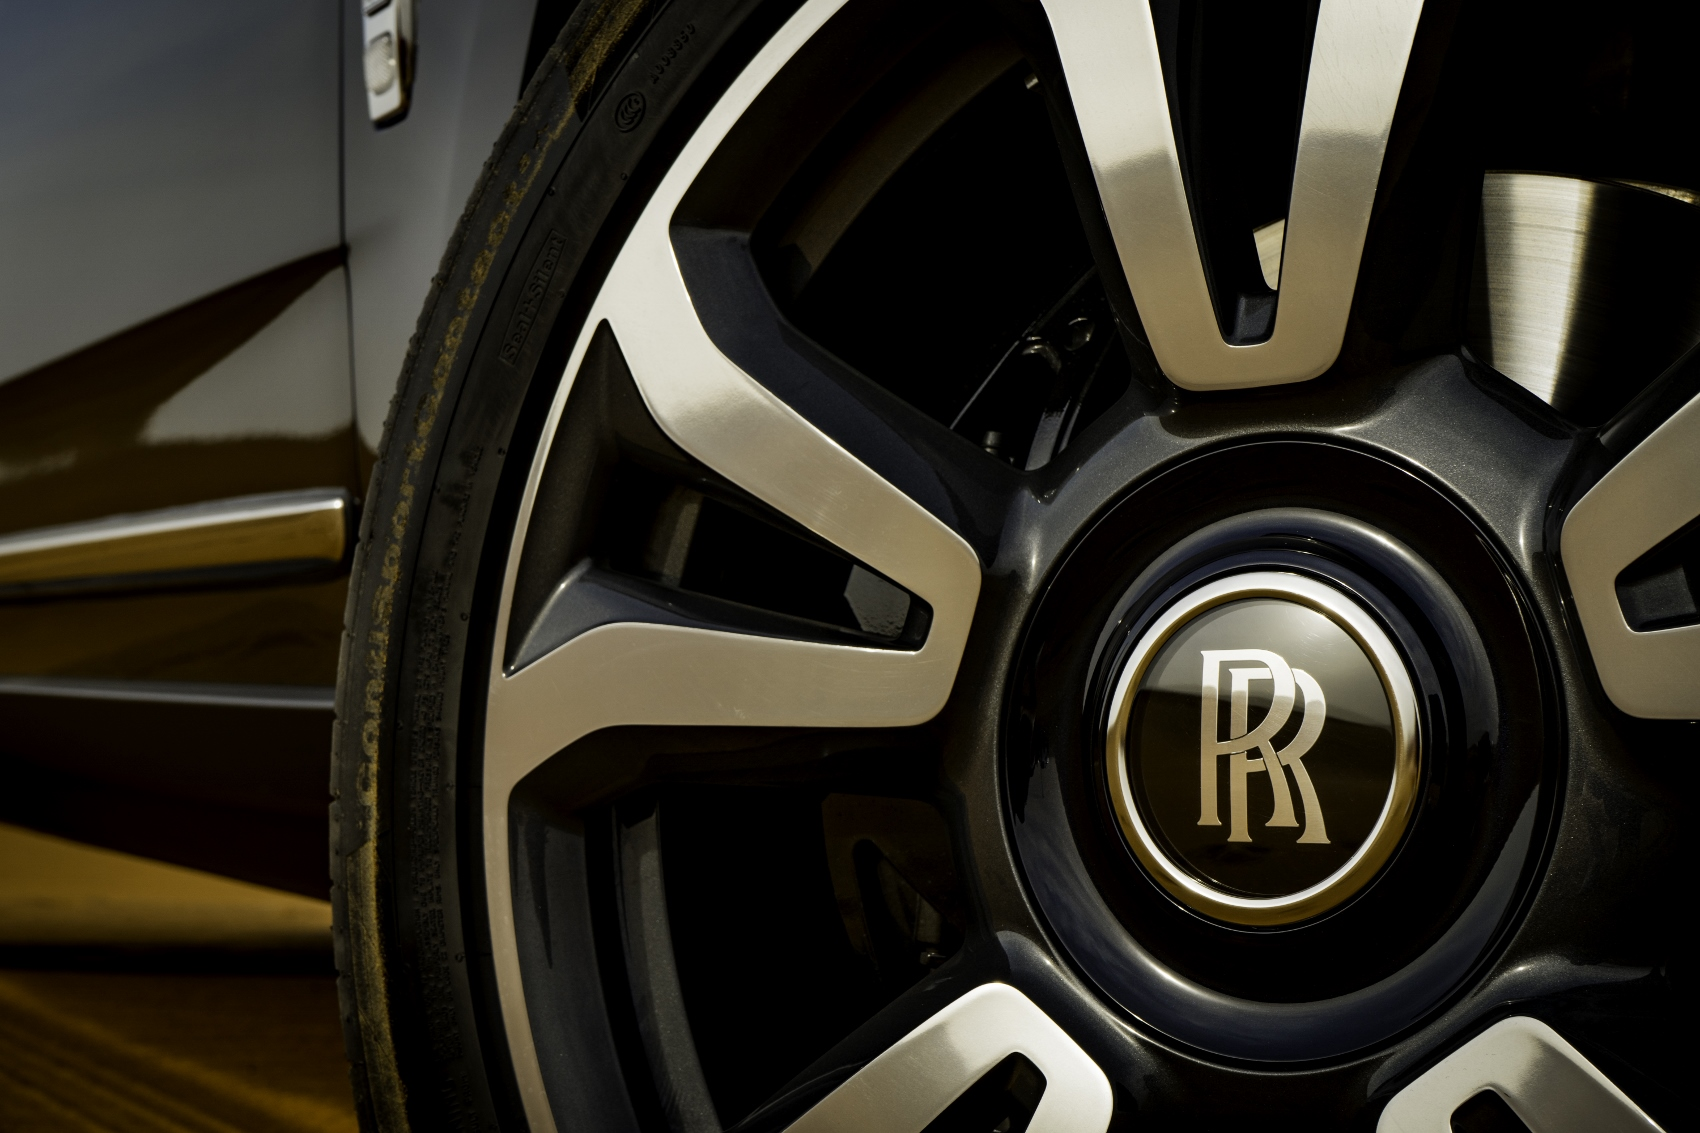 Rolls Royce Cullinan sa predviedol na púšti. Pozrite si foto aj video oFlQYHmeNw rolls-royce-cullina